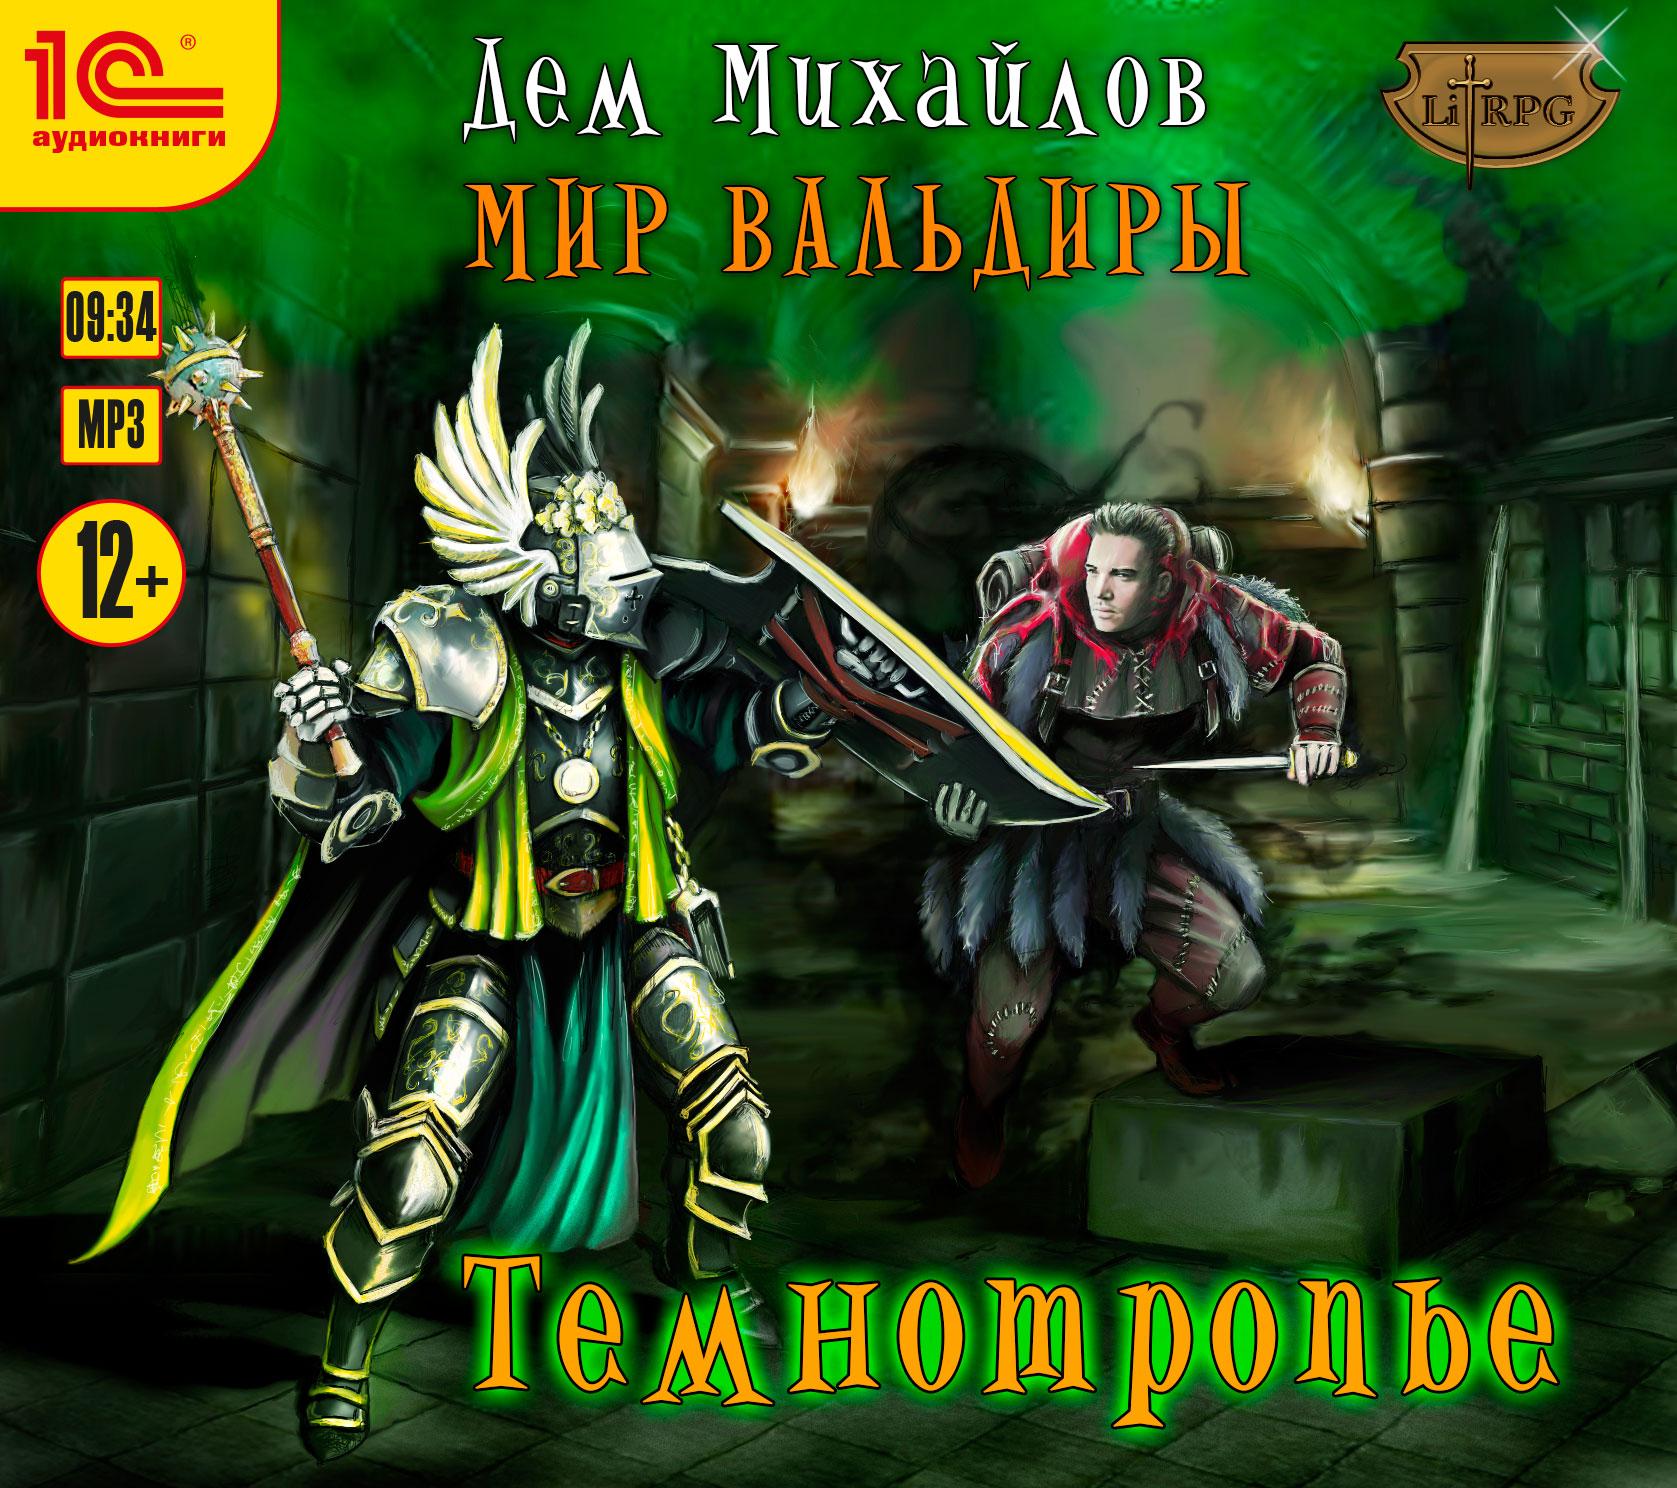 Дем Михайлов Темнотропье цены онлайн